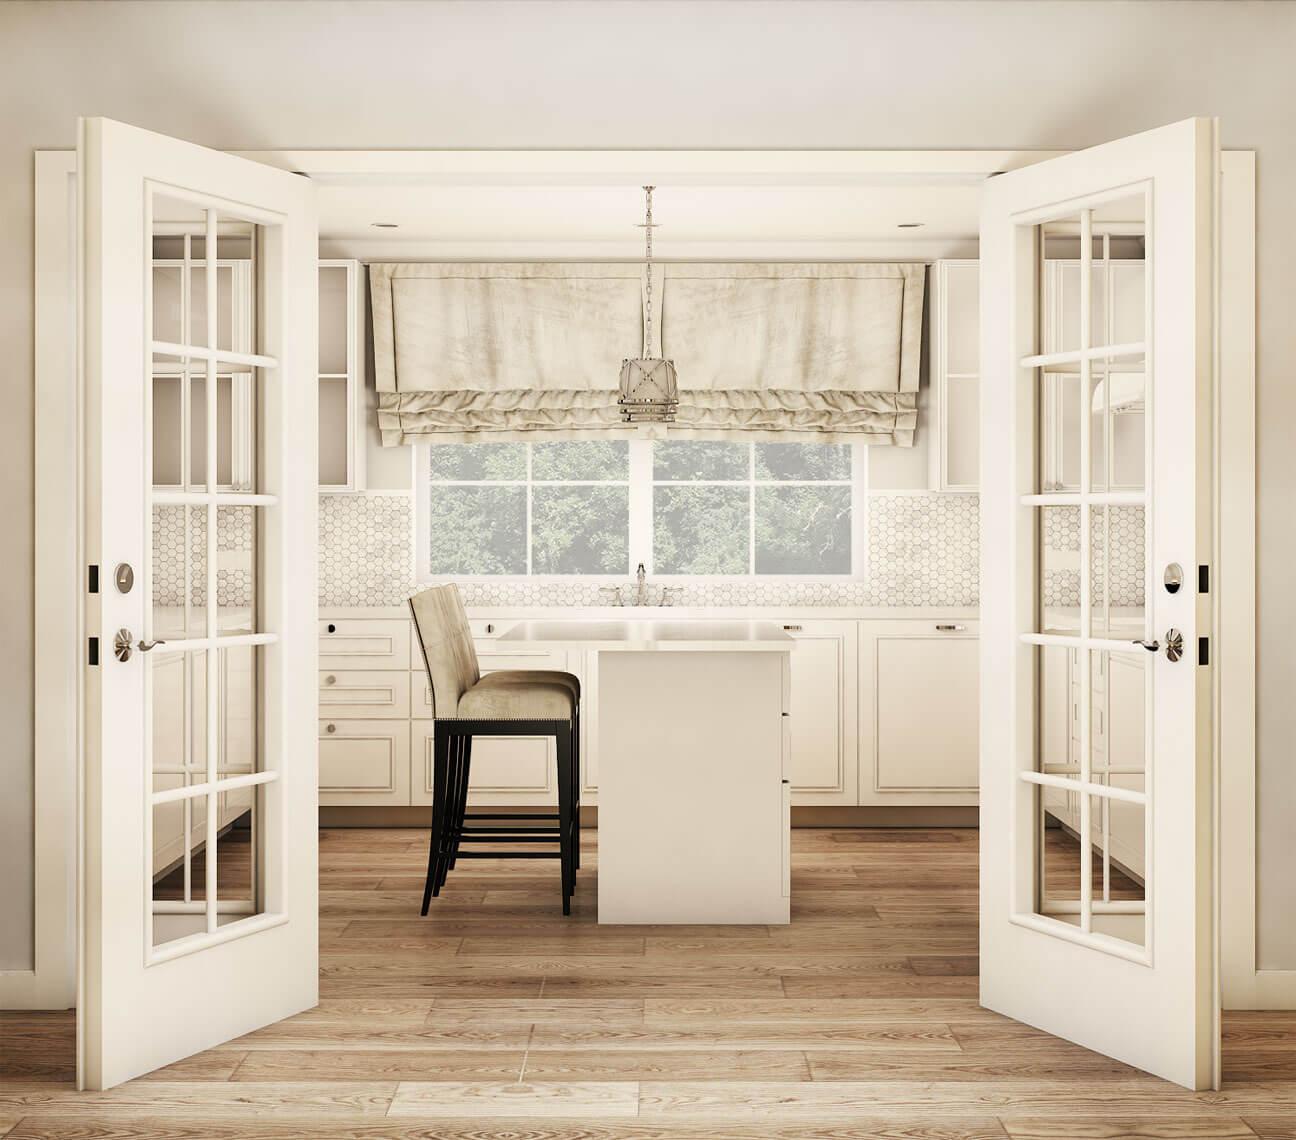 Modernios-klasikos-virtuve.jpg